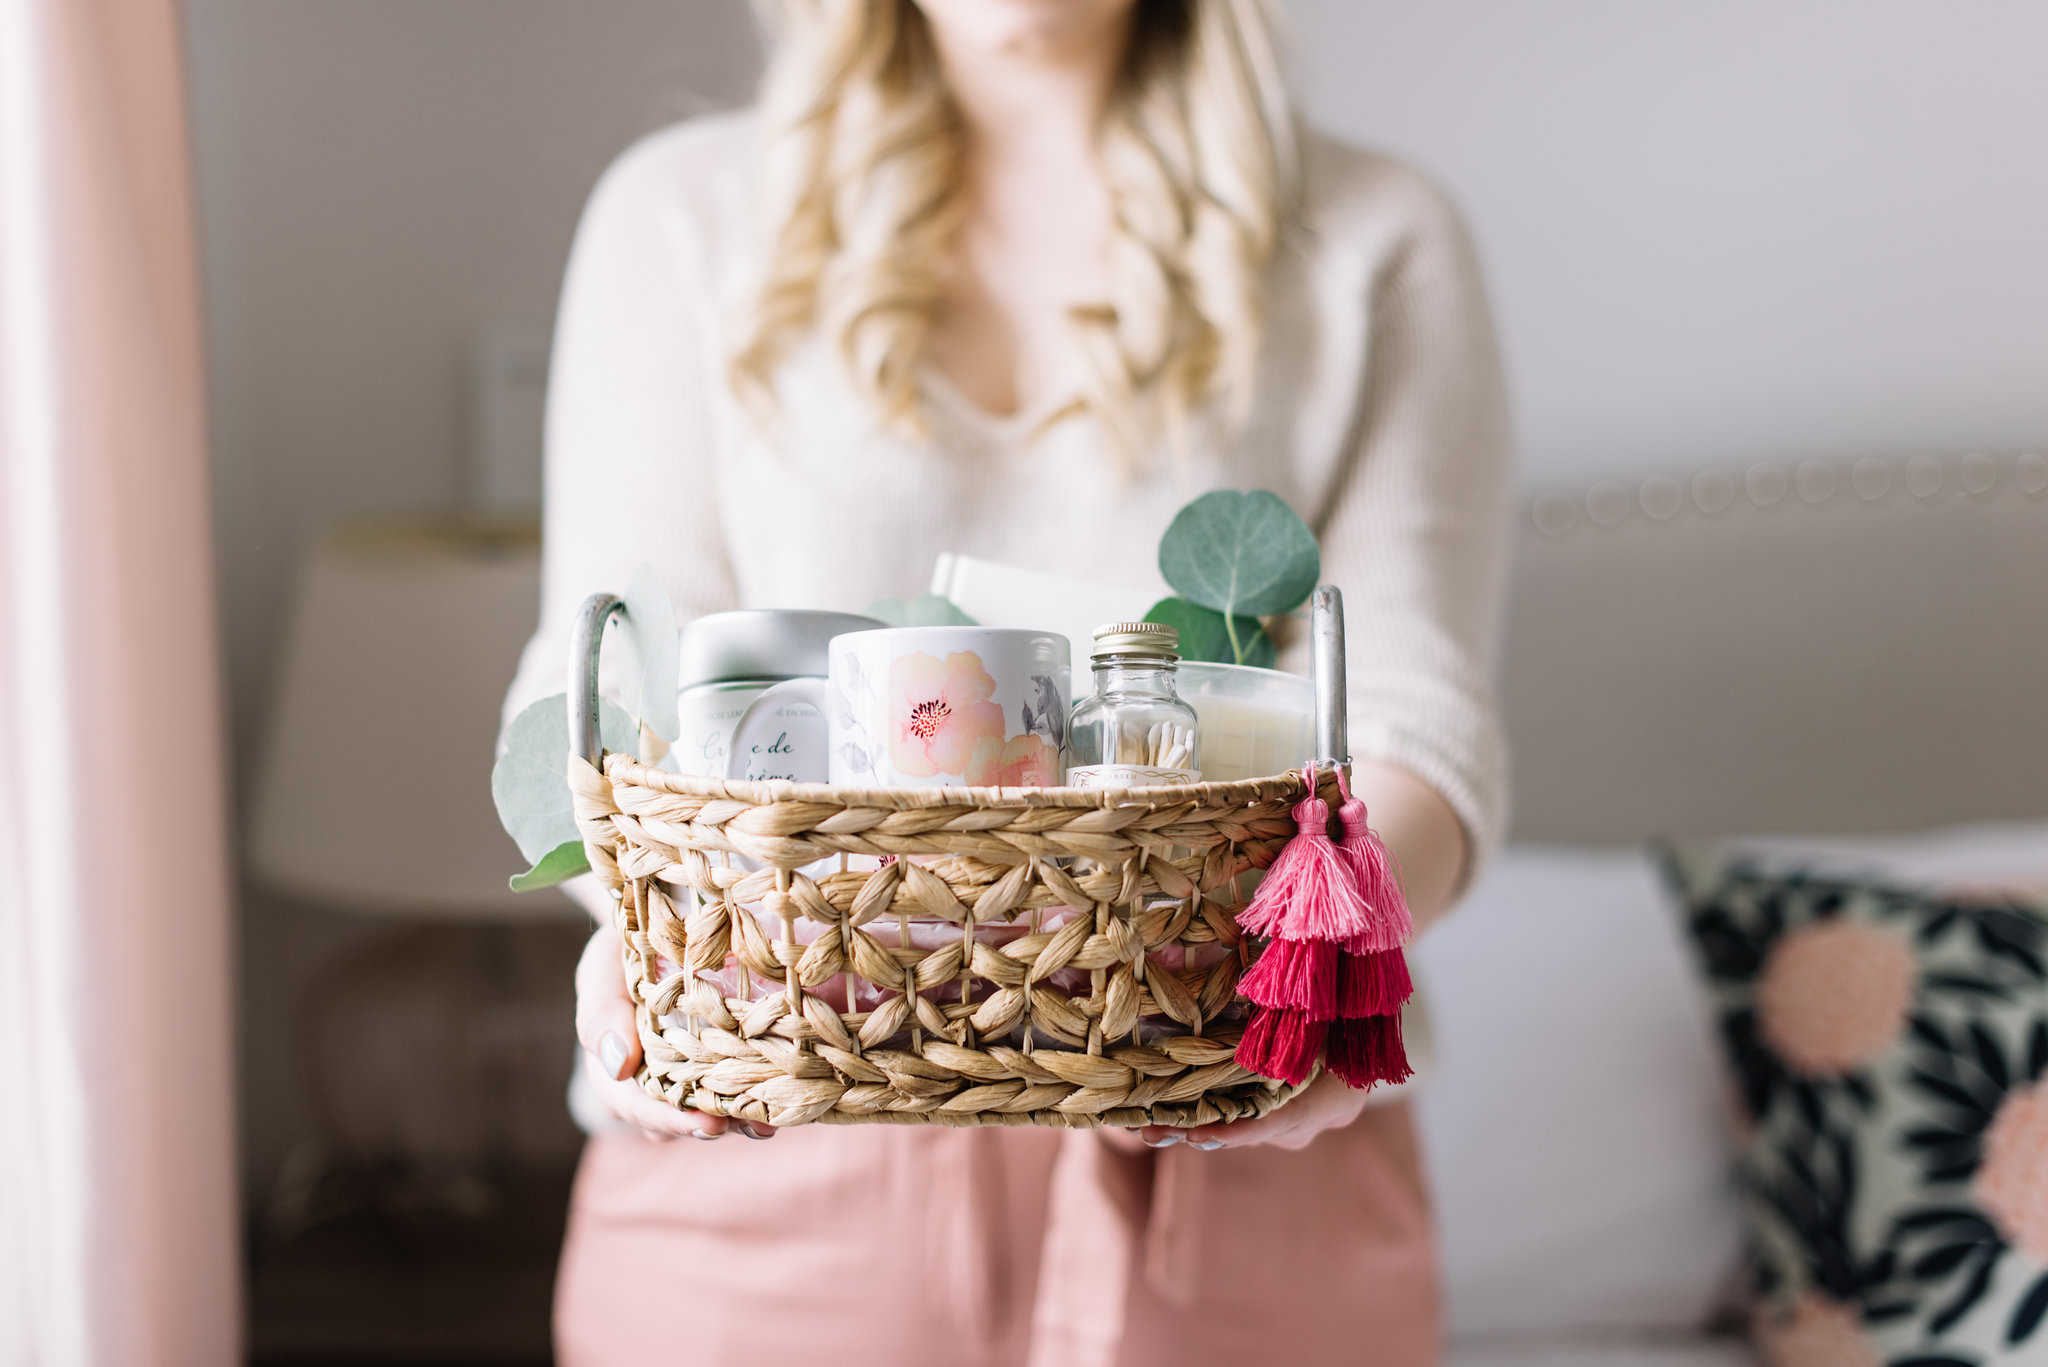 DIY mother's day gift basket